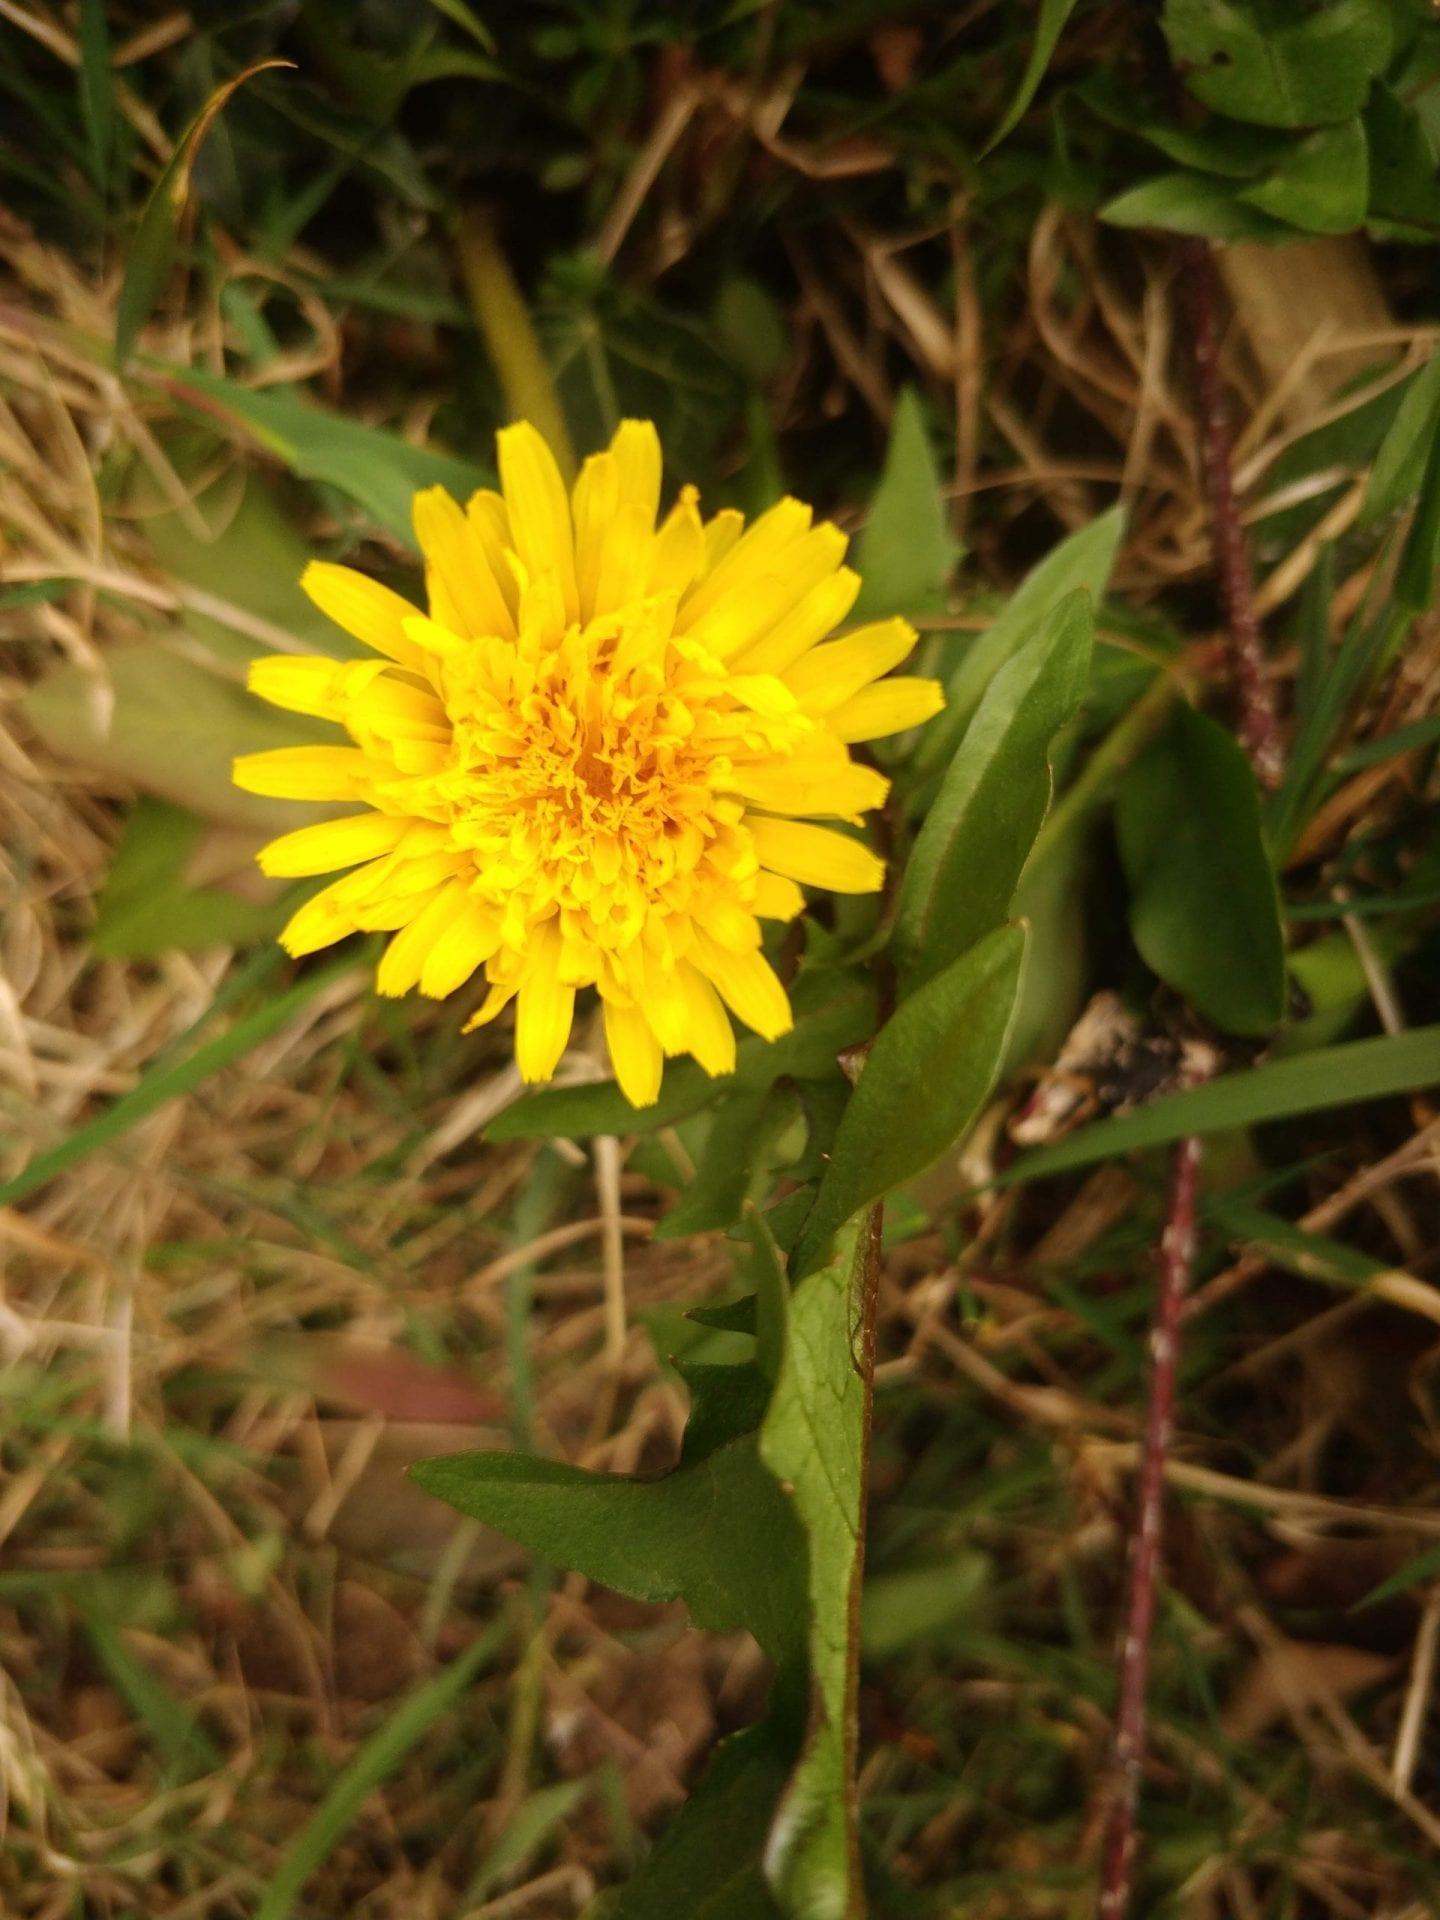 yellow-dandelion-flower